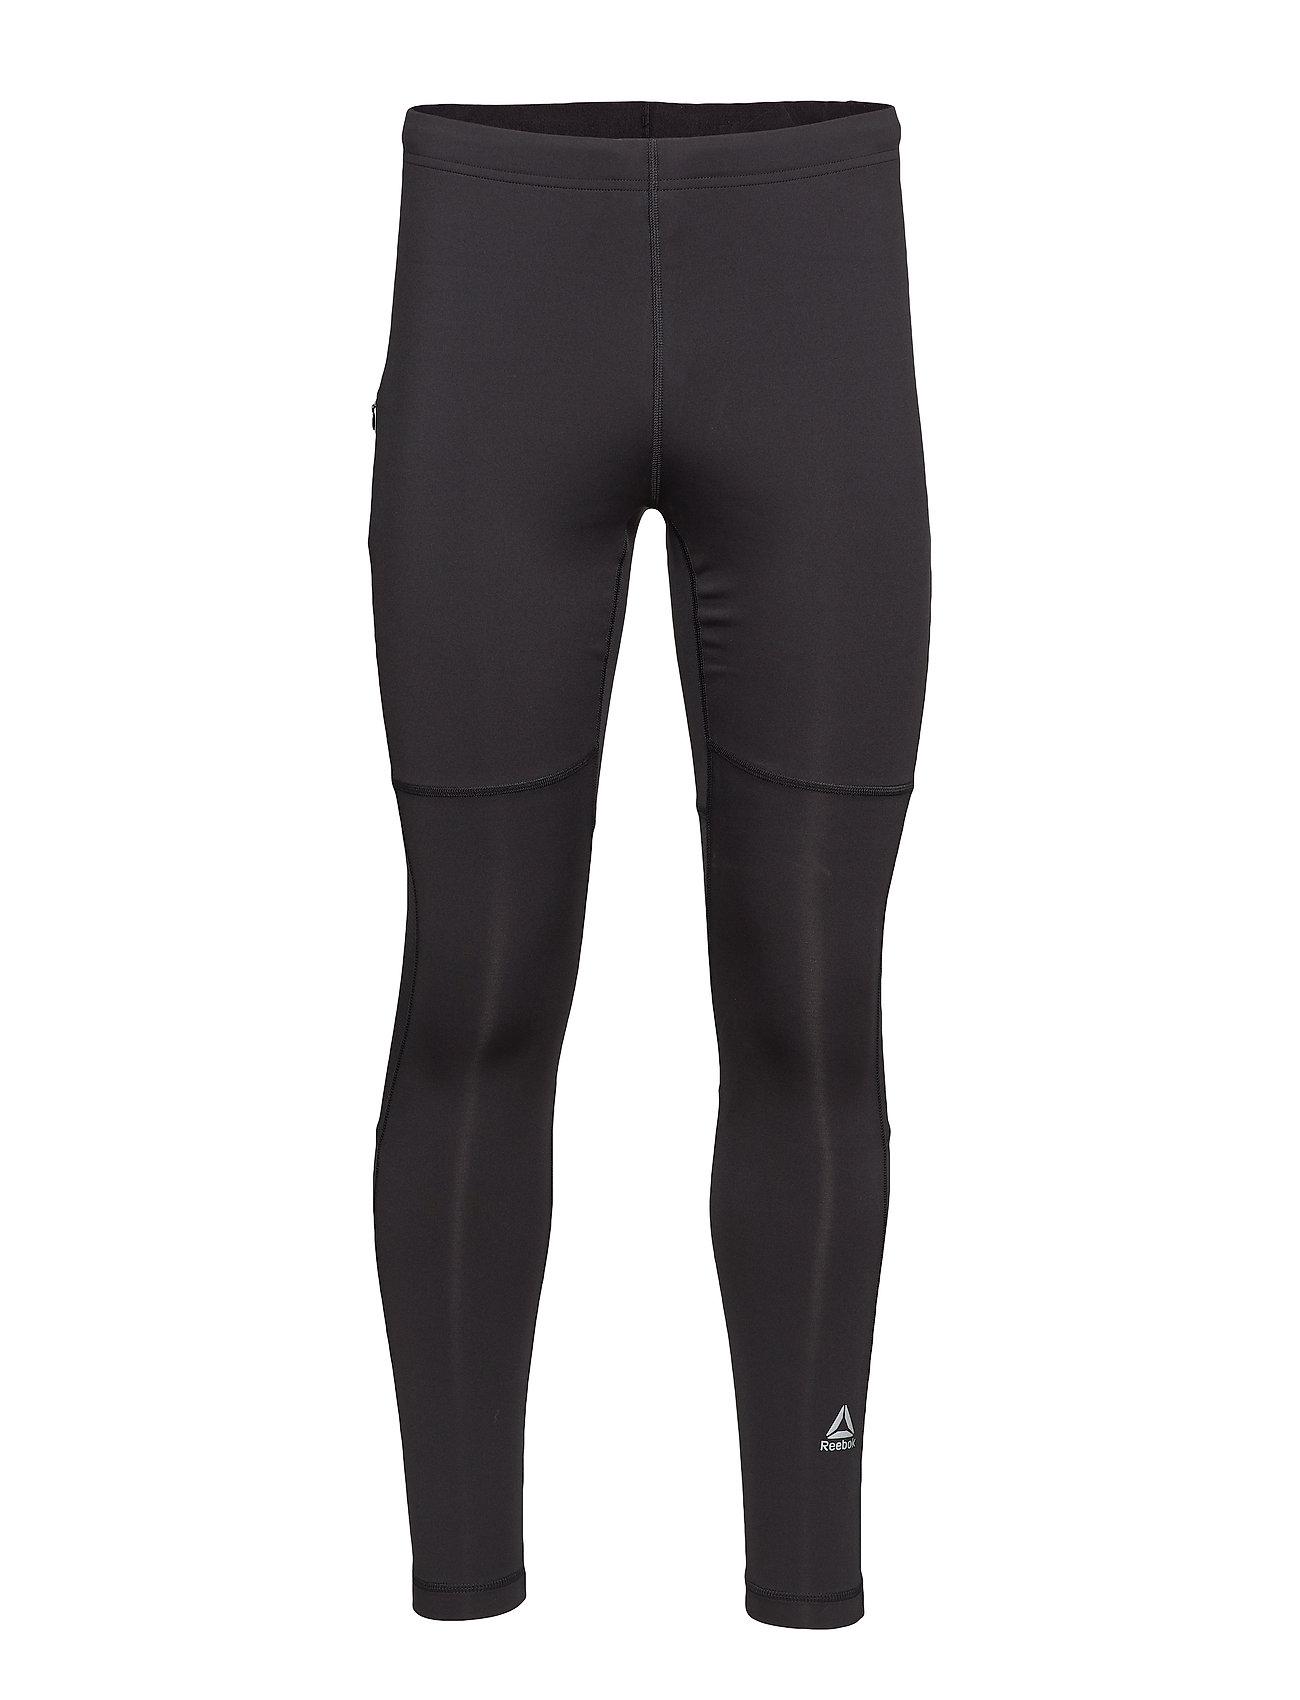 Reebok RE SPEEDWICK TIGHT Tights & shorts